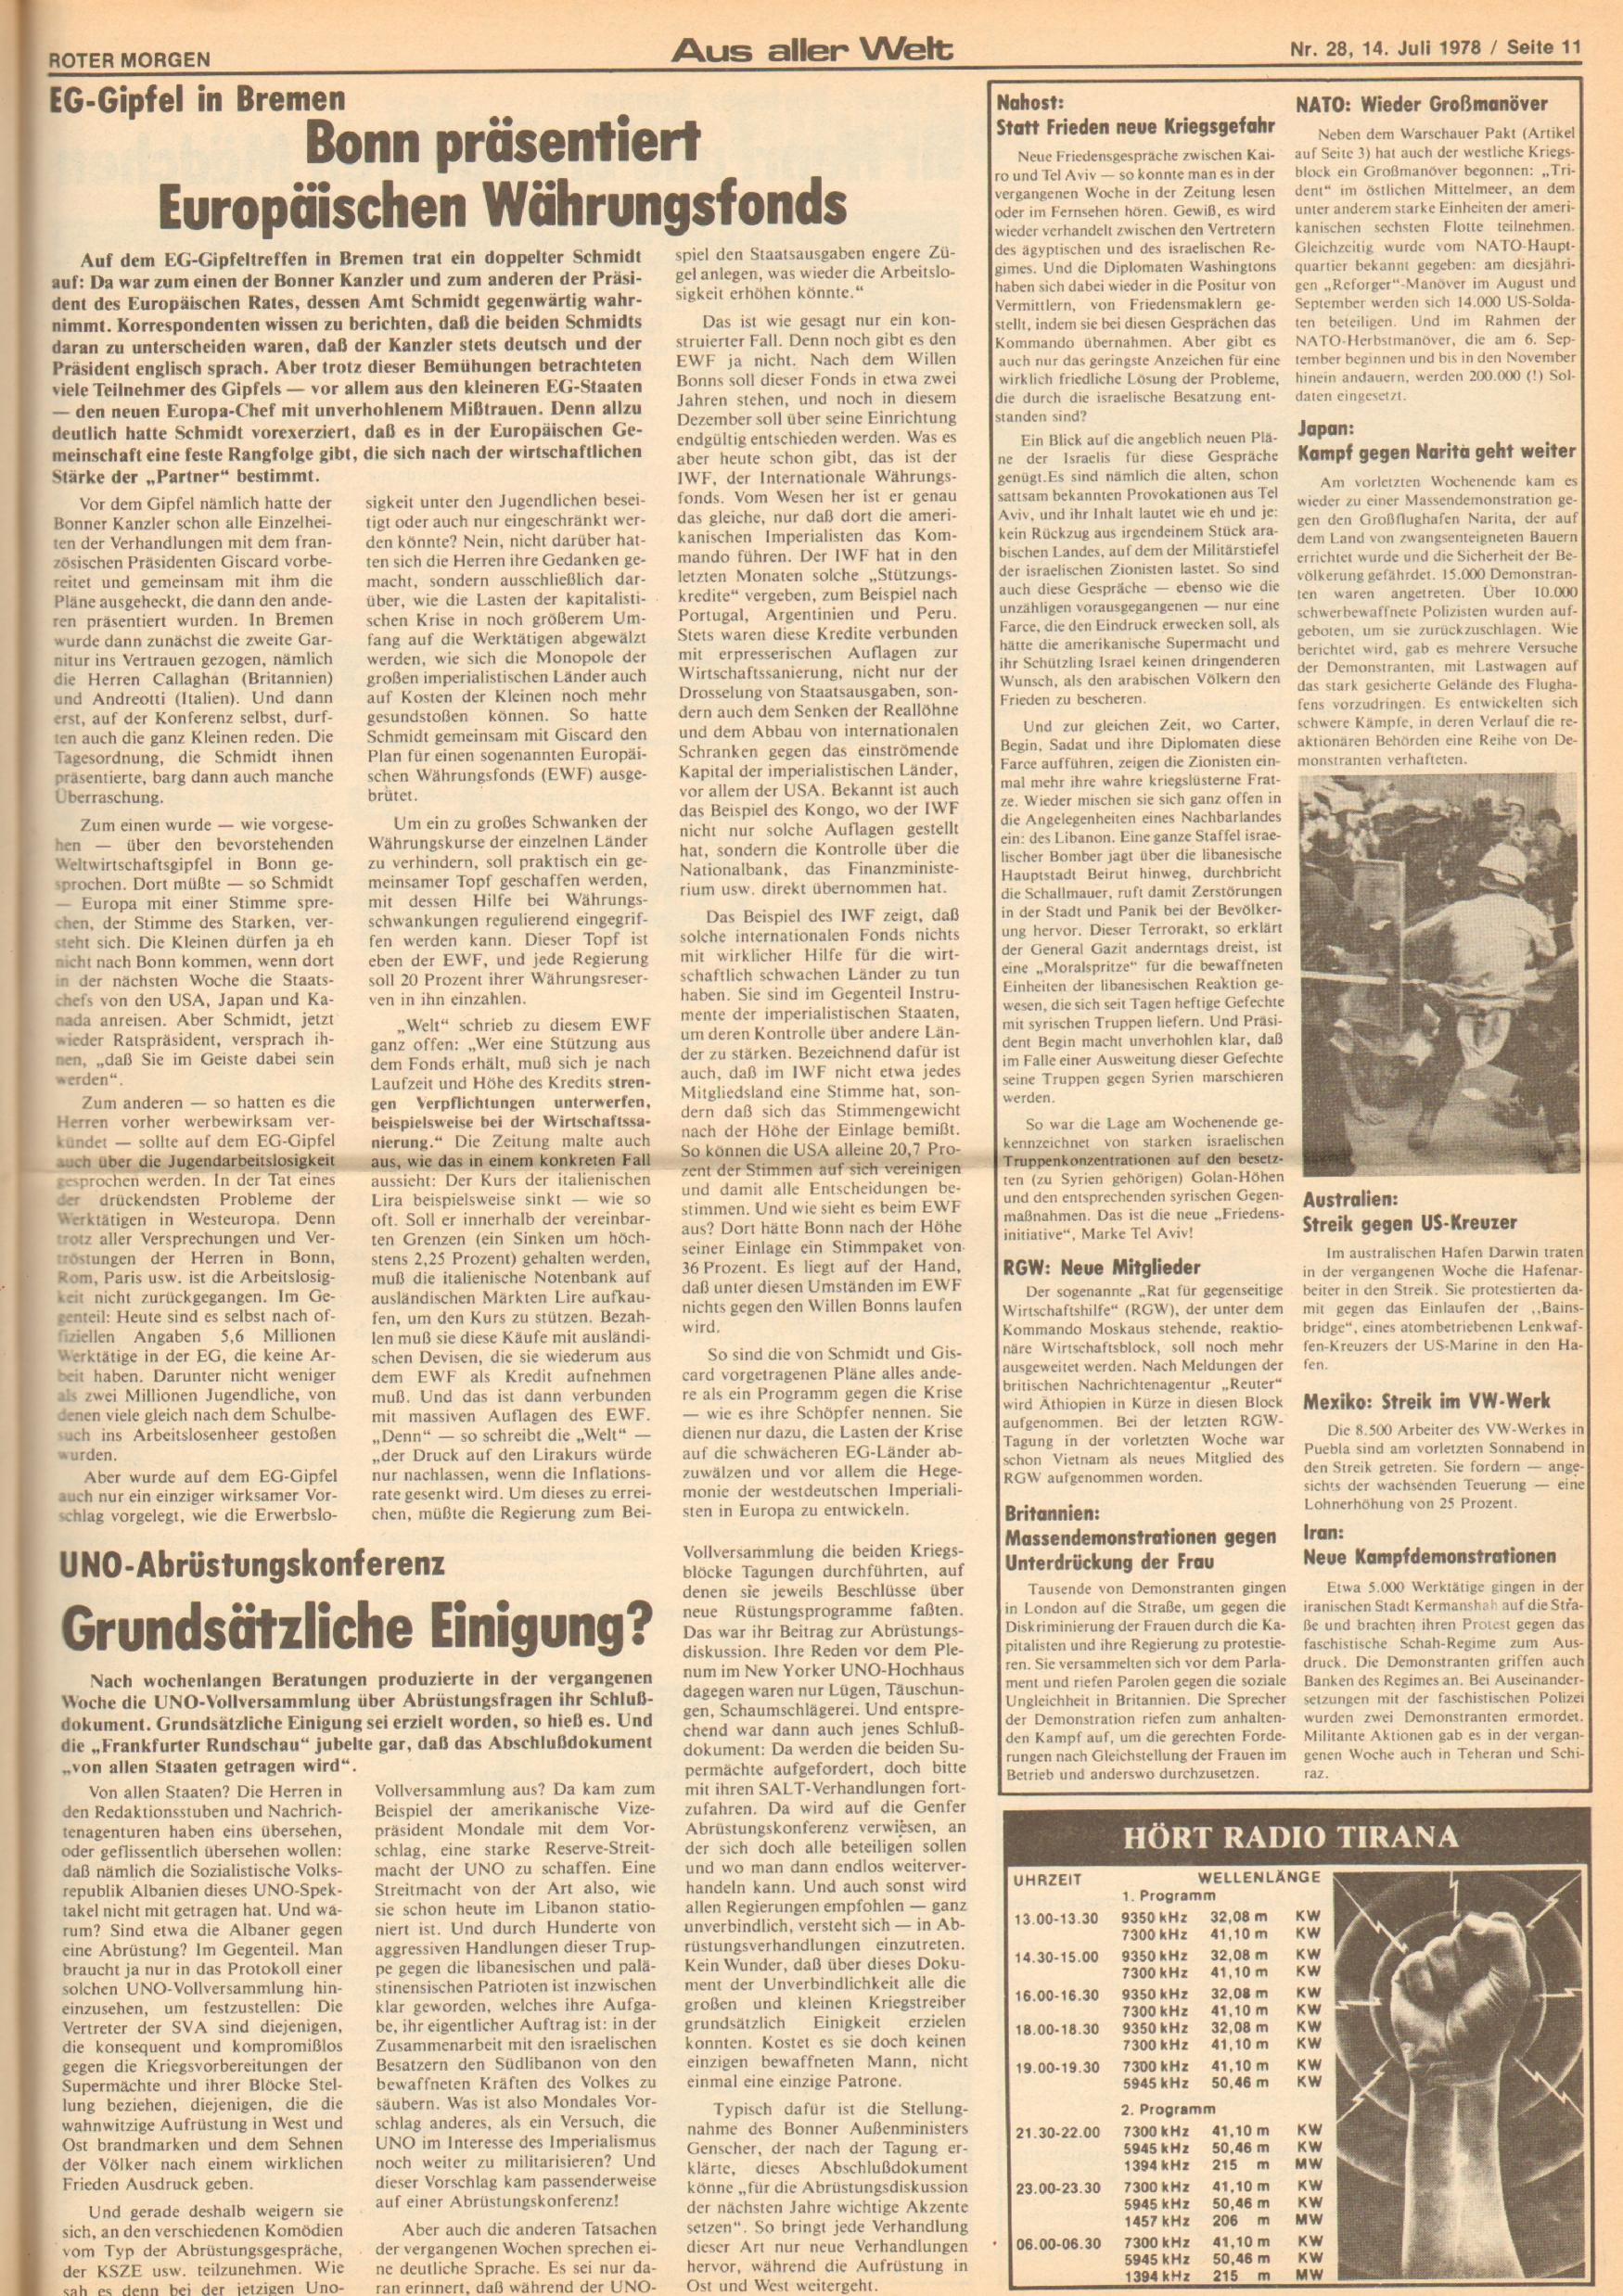 Roter Morgen, 12. Jg., 16. Juli 1978, Nr. 28, Seite 11